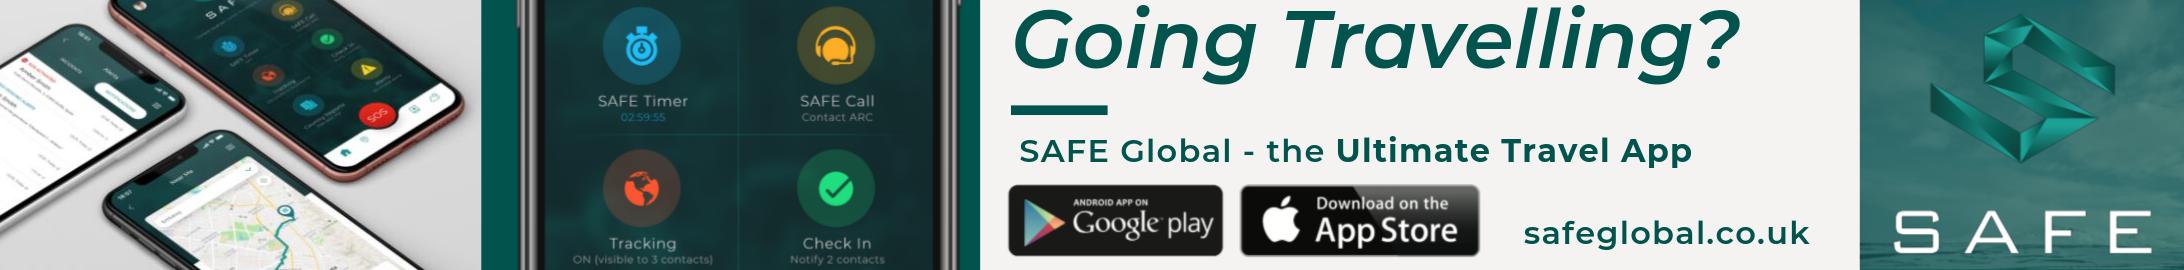 https://www.safeglobal.co.uk/